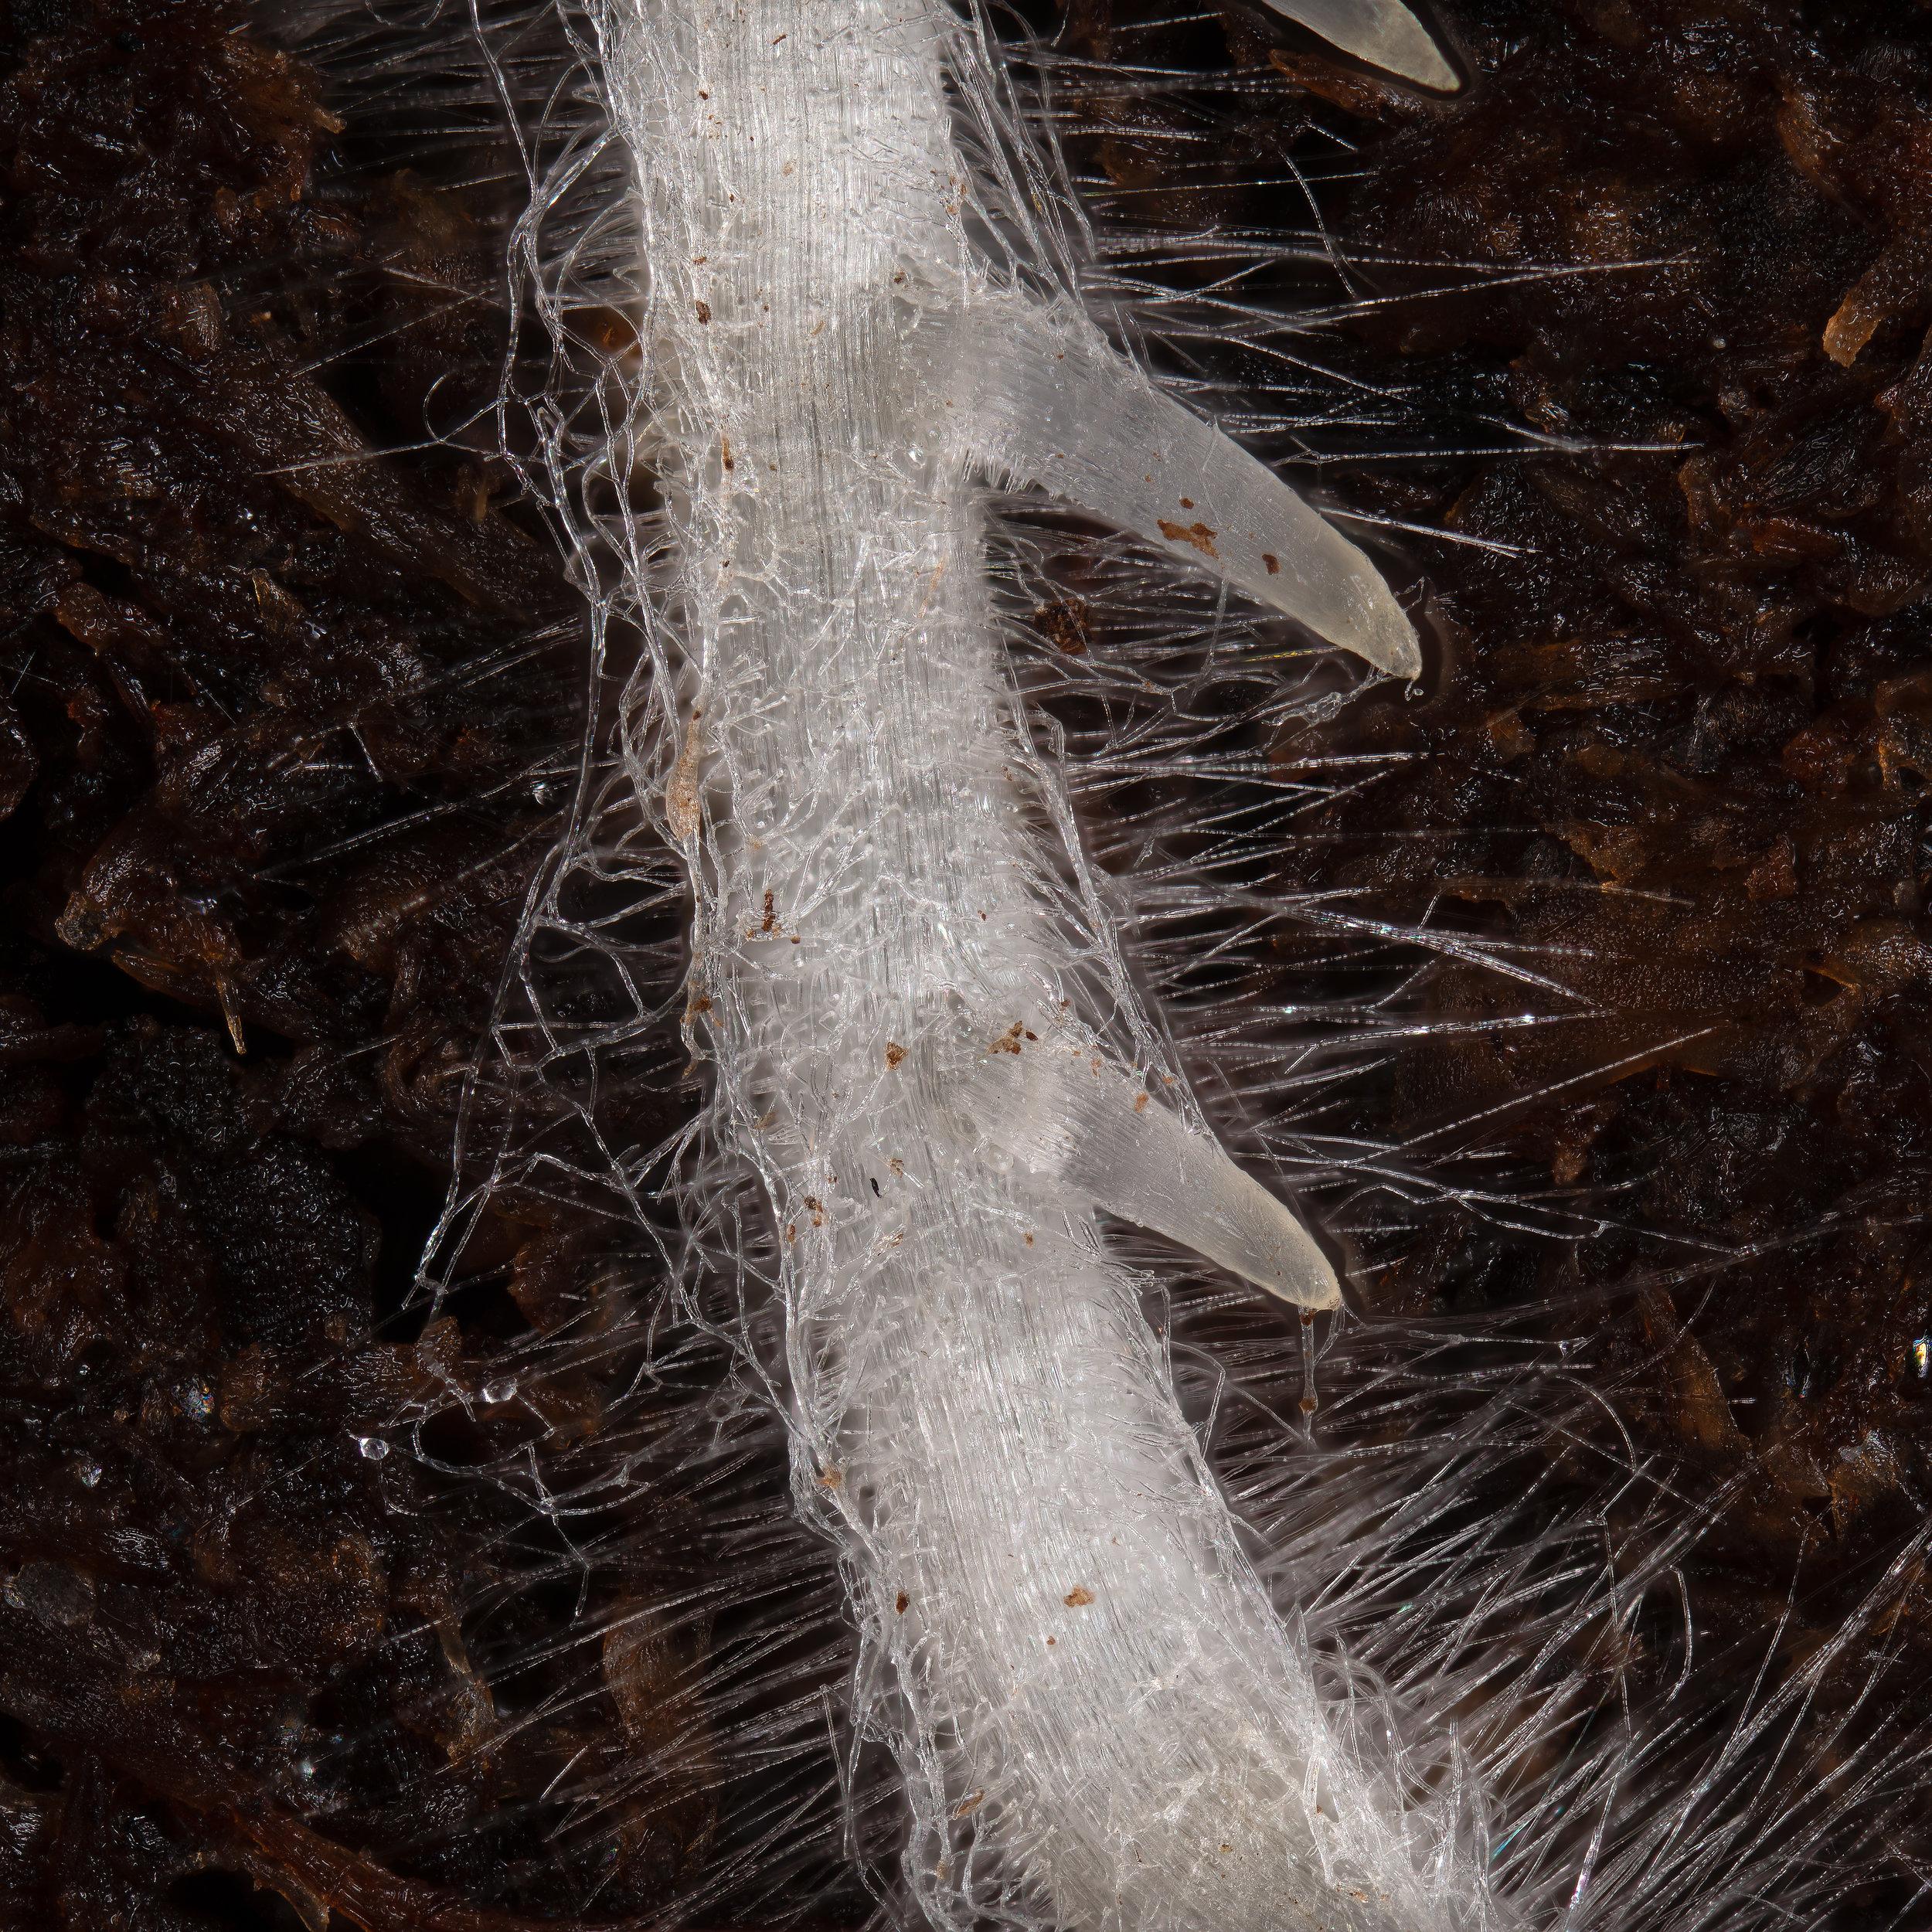 Macro shot from cannabis root hairs